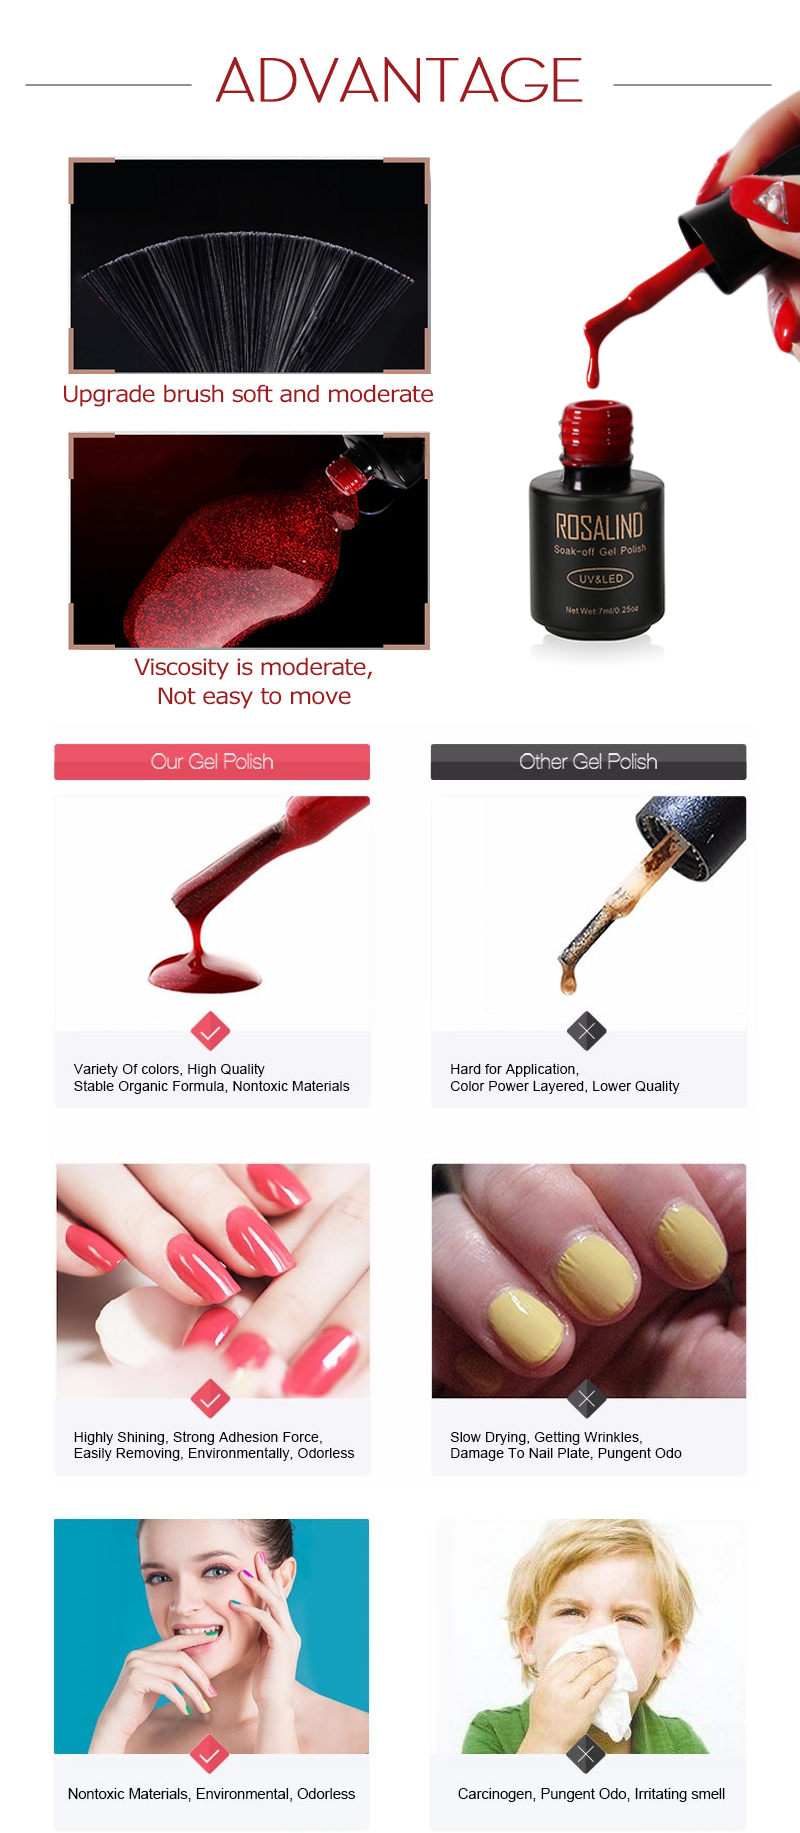 ᗔROSALIND Gel 40S Firework Gel Nail Polish 40ML UV Glitter Manicure ...